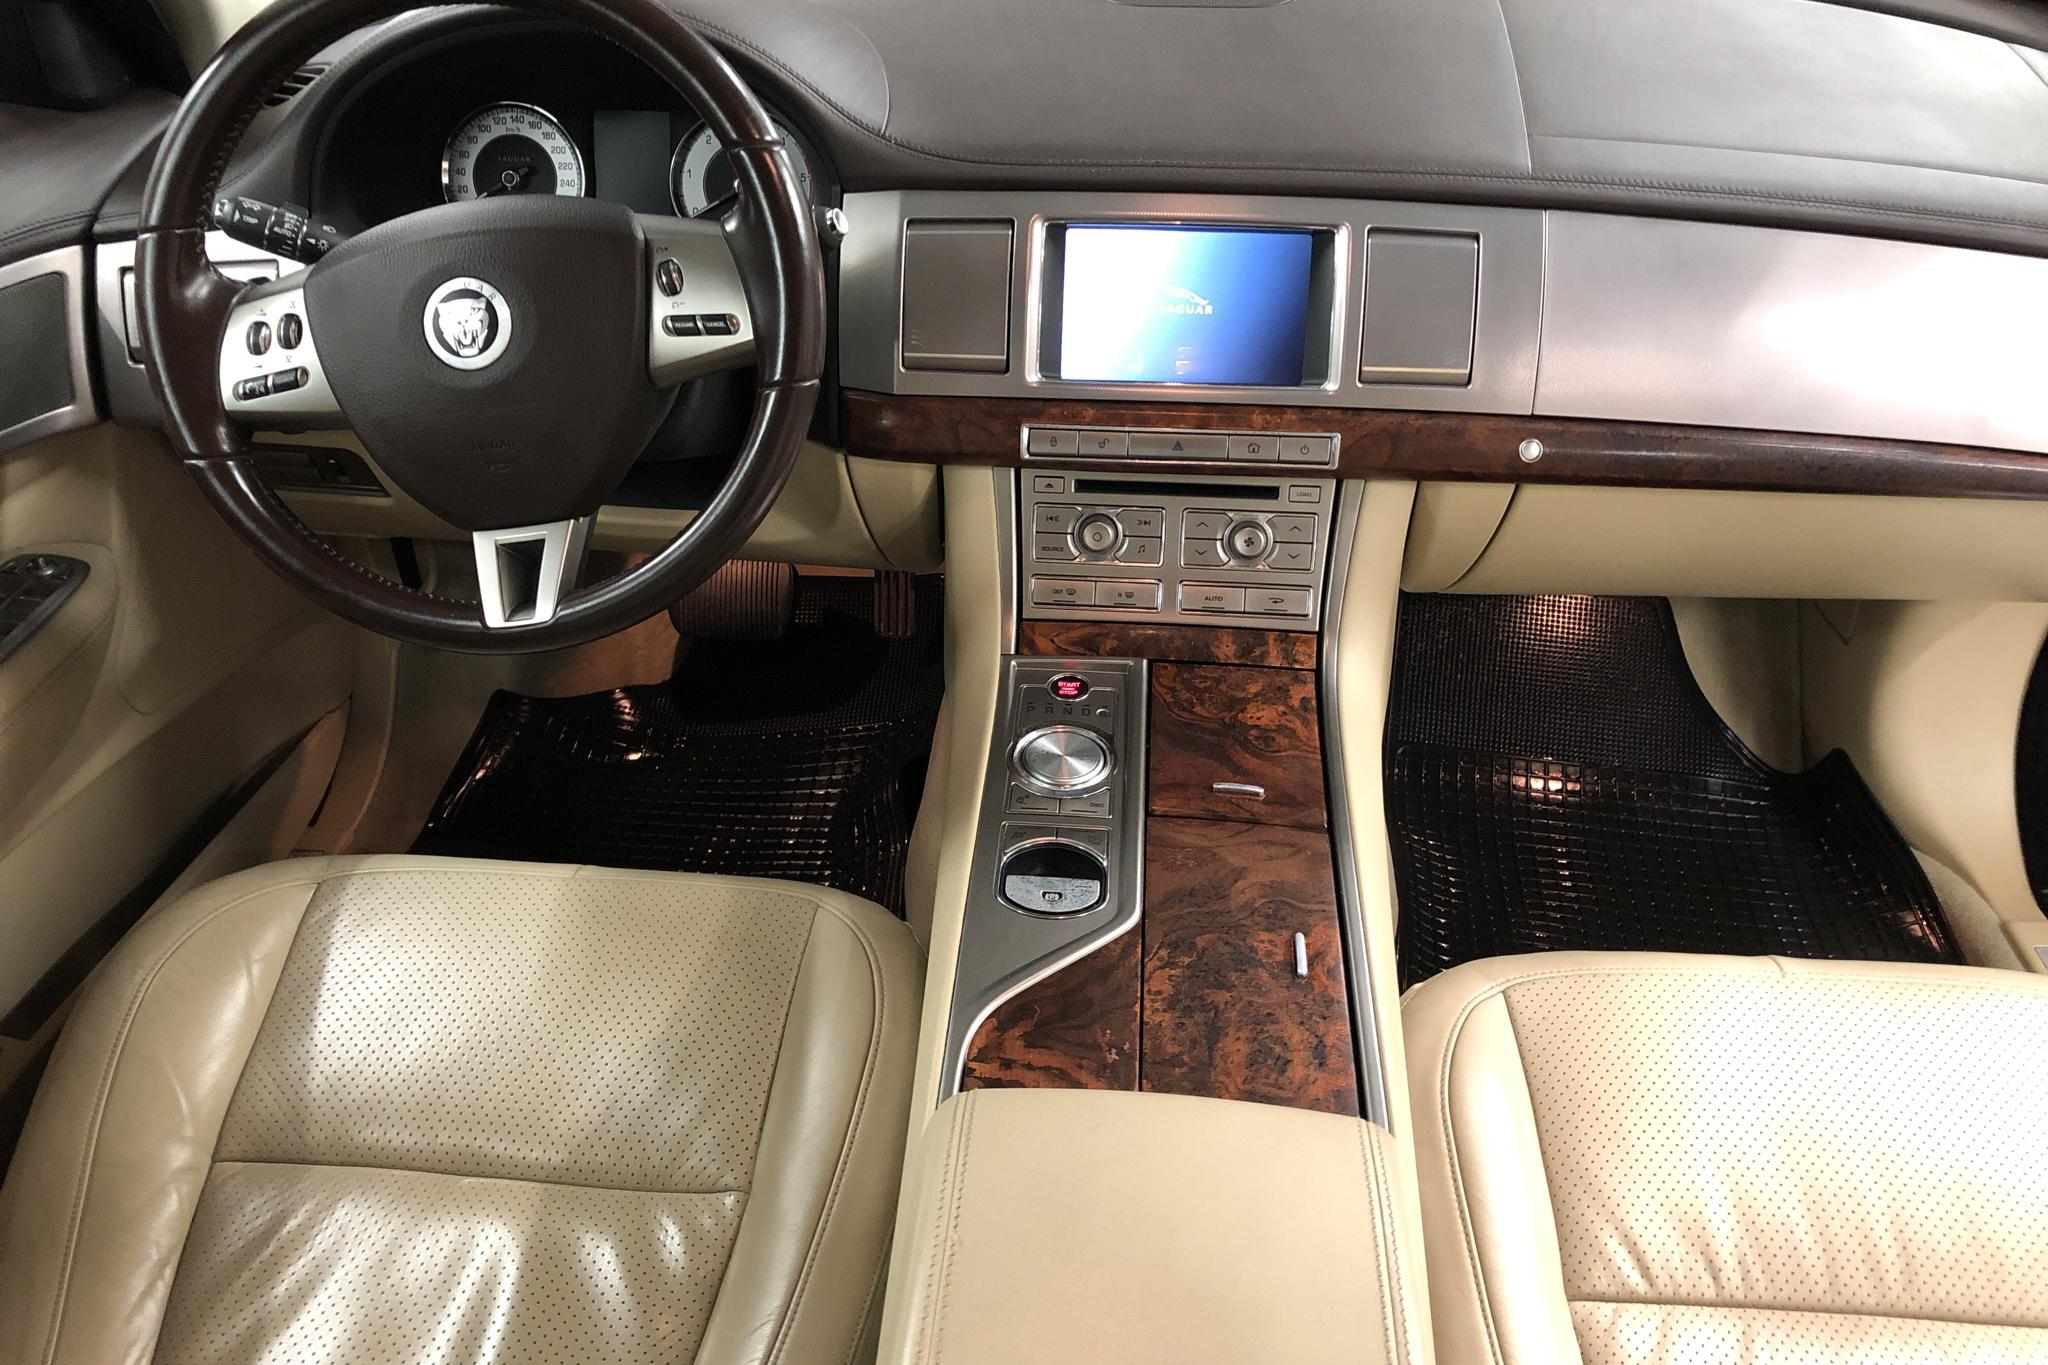 Jaguar XF 3.0 D (240hk) - 15 328 mil - Automat - vit - 2011